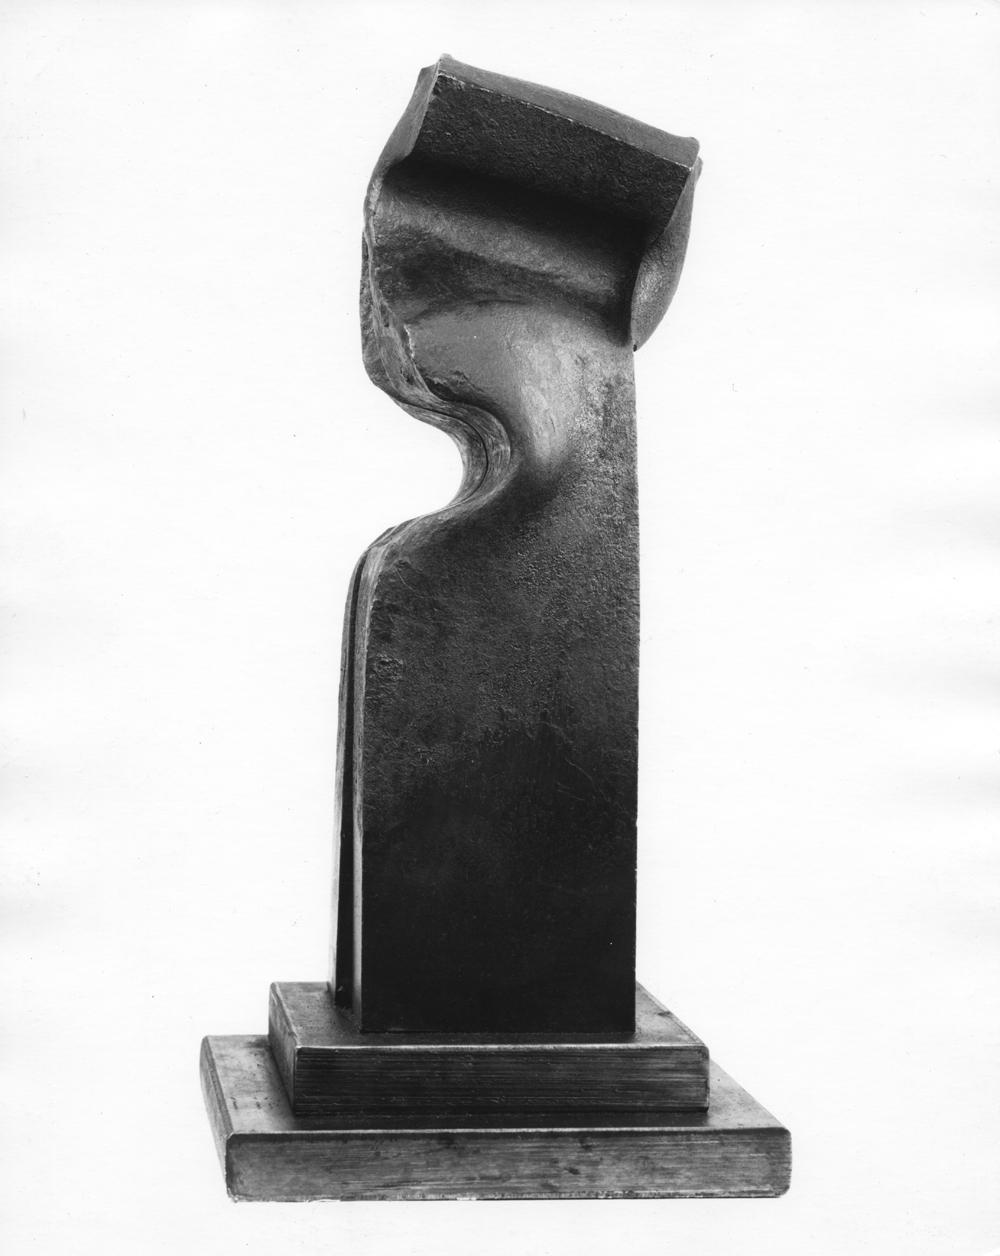 1981_AK_Zahin#1_side view_fer forge_17x4x4''_43,2x10,2x10,2cm_56kg_Collection Mr and Mrs Carl M. Freeman_Washington_SonnabendNY.jpg